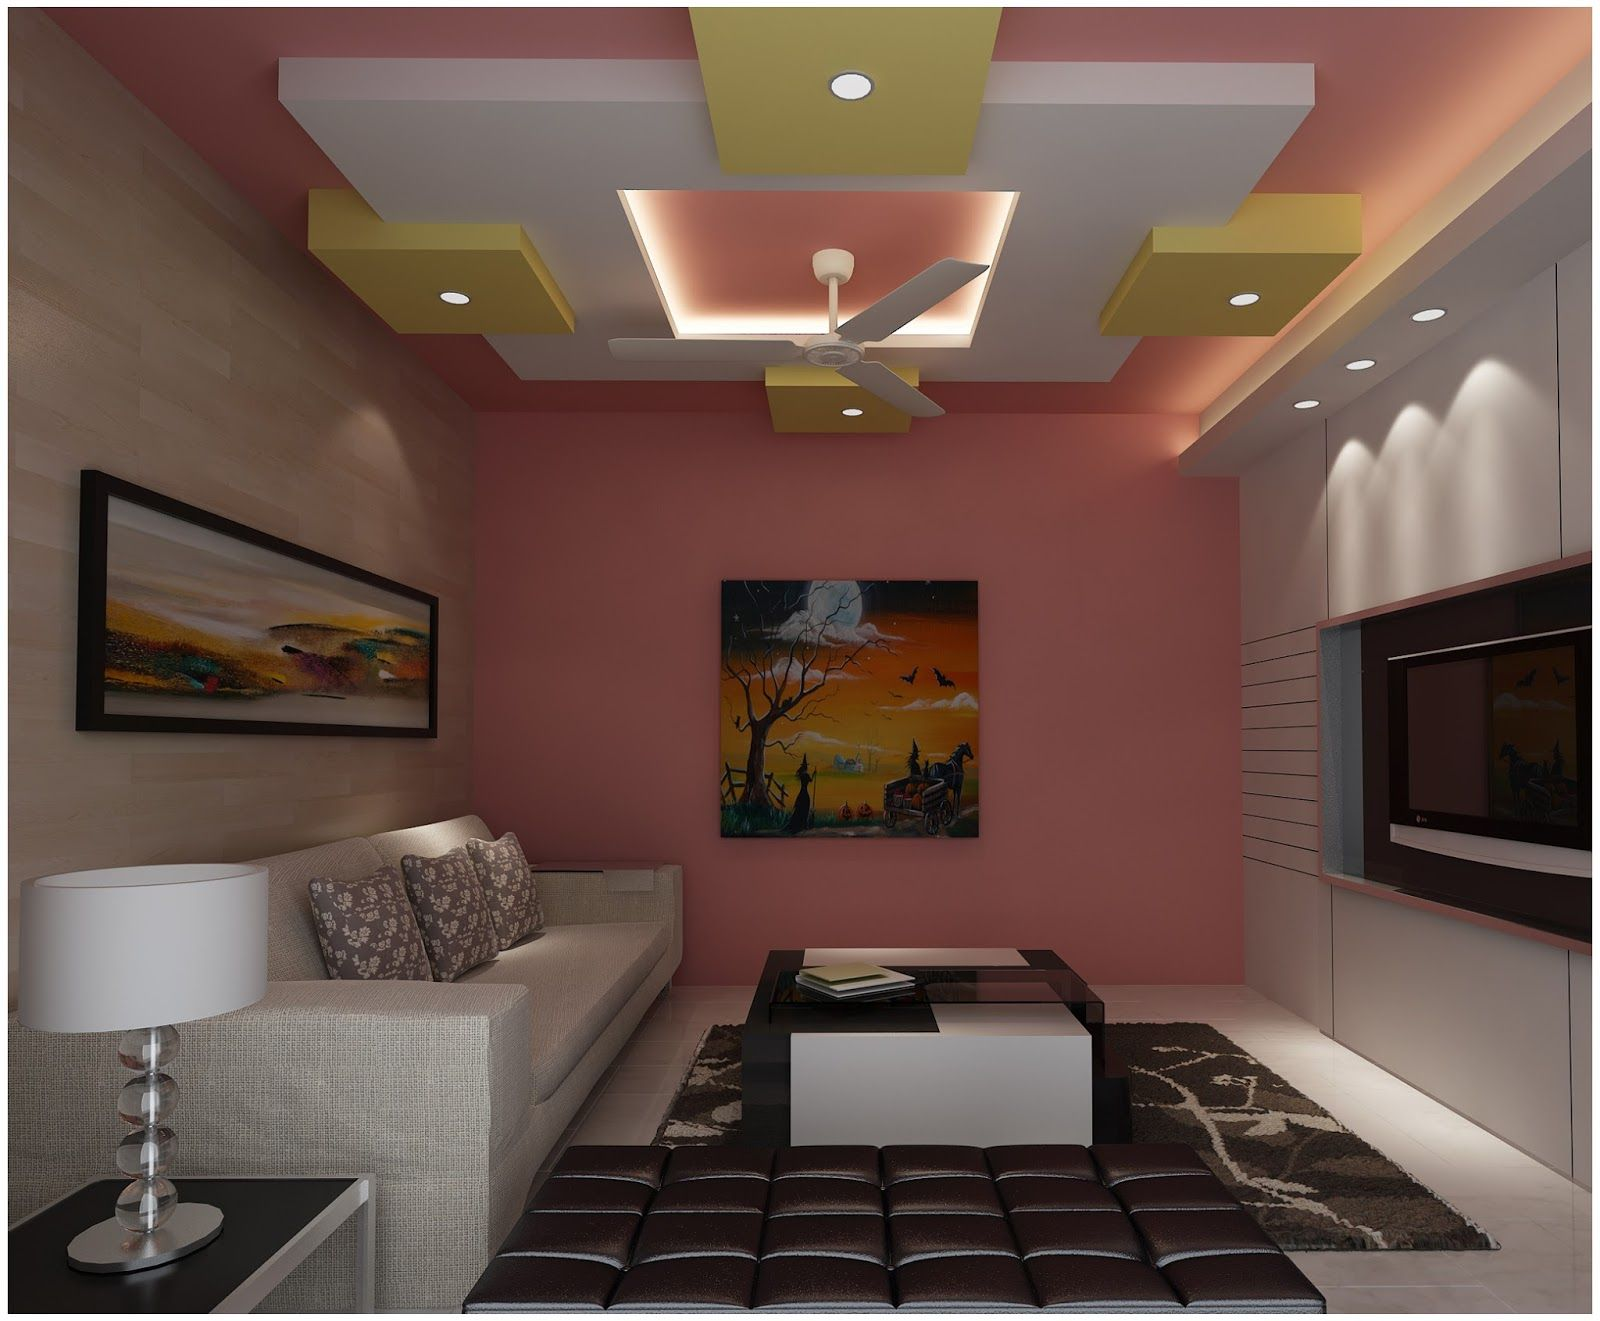 Image Result For Square Pop Design Living Ceiling Design Mo